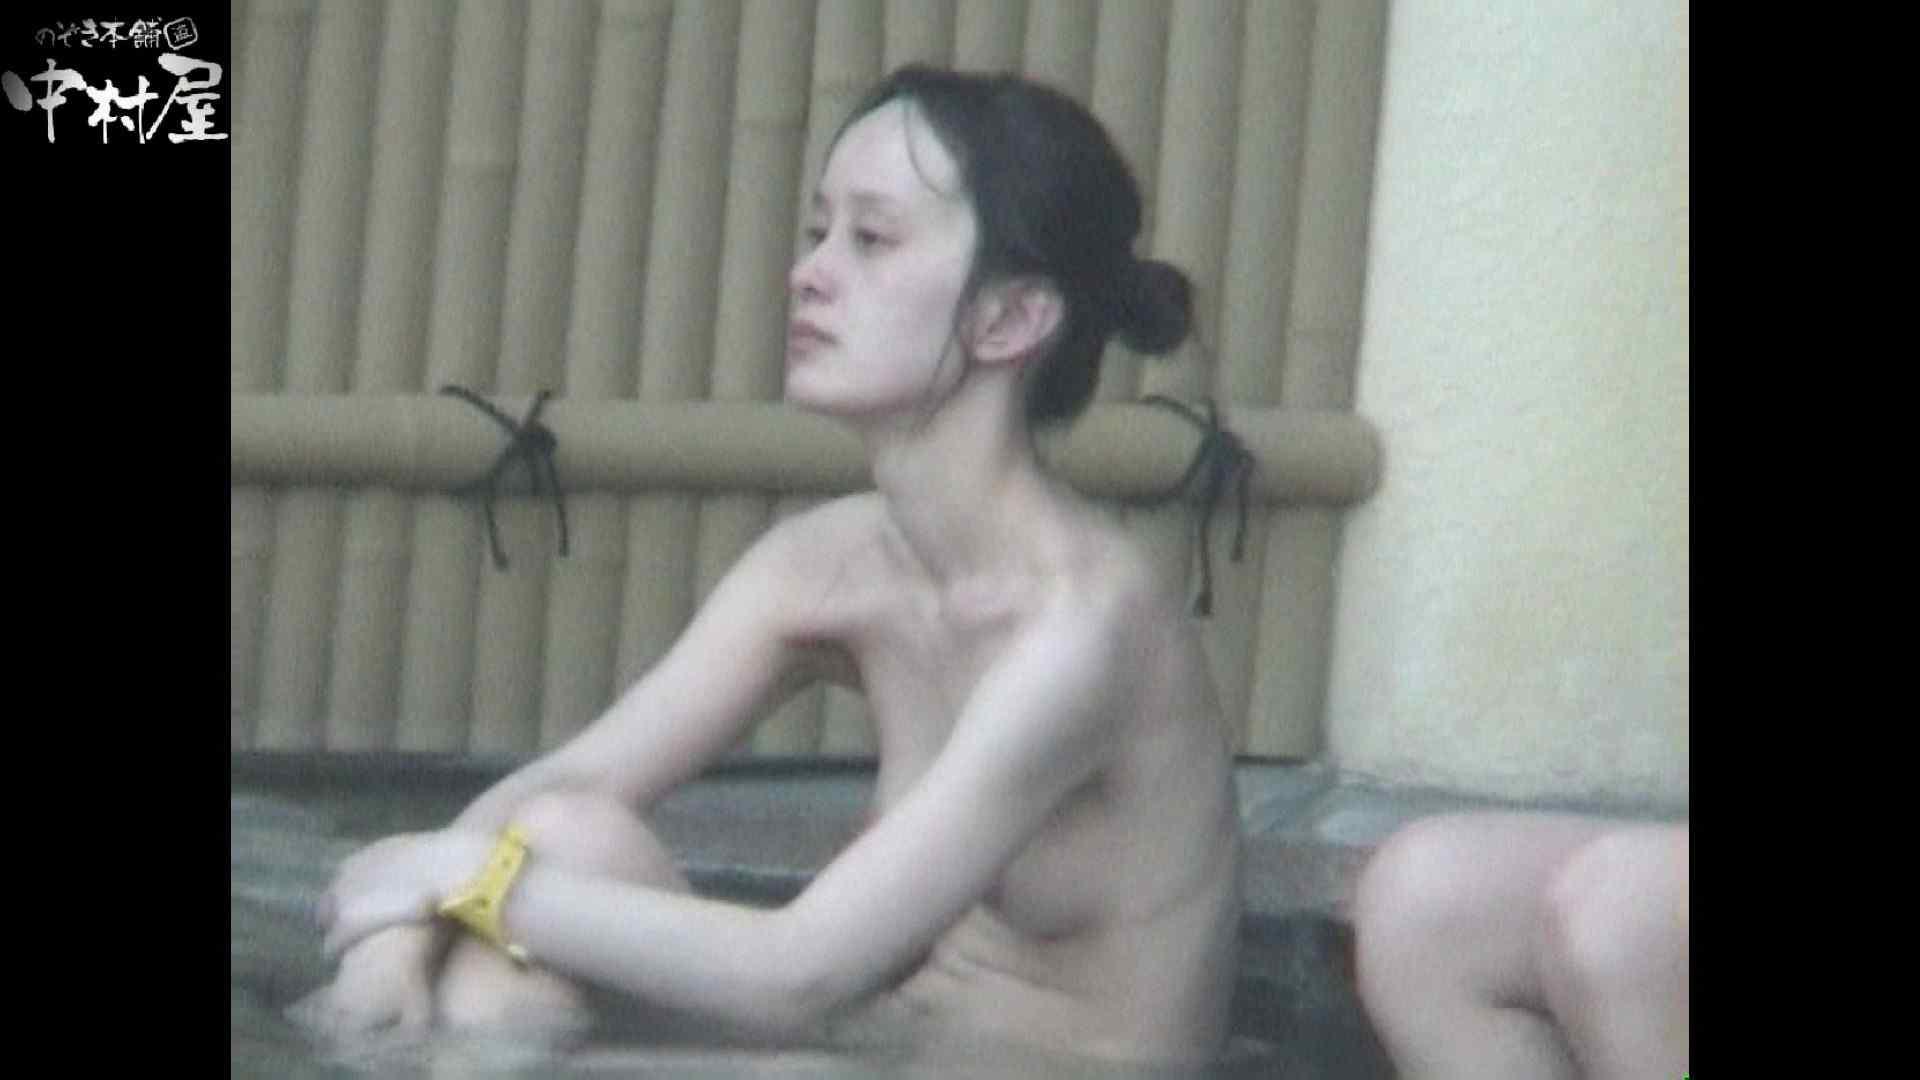 Aquaな露天風呂Vol.973 美しいOLの裸体 性交動画流出 95pic 59